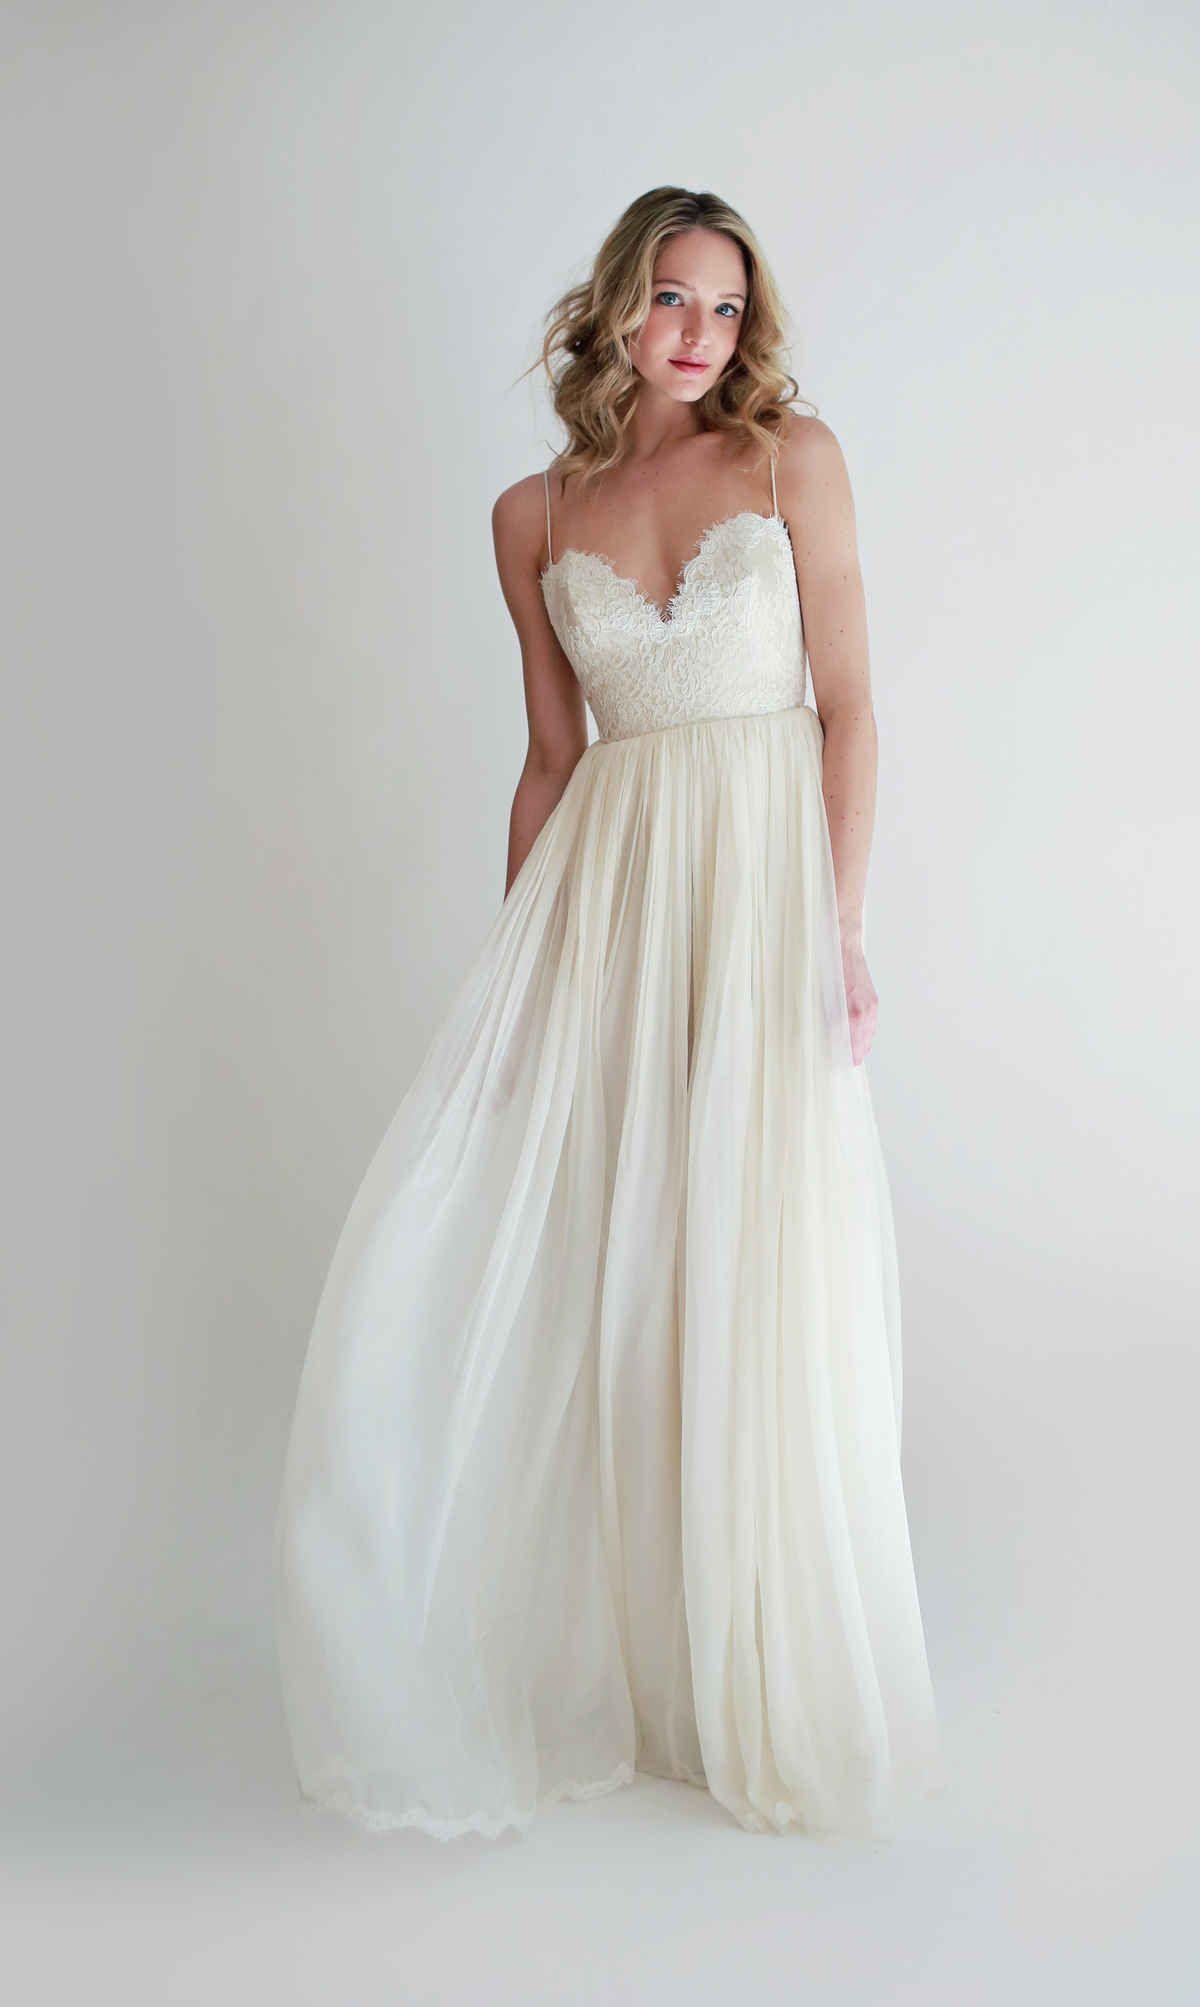 Best beach wedding dresses  Best Beach Wedding Dresses for   Leanne marshall Wedding and